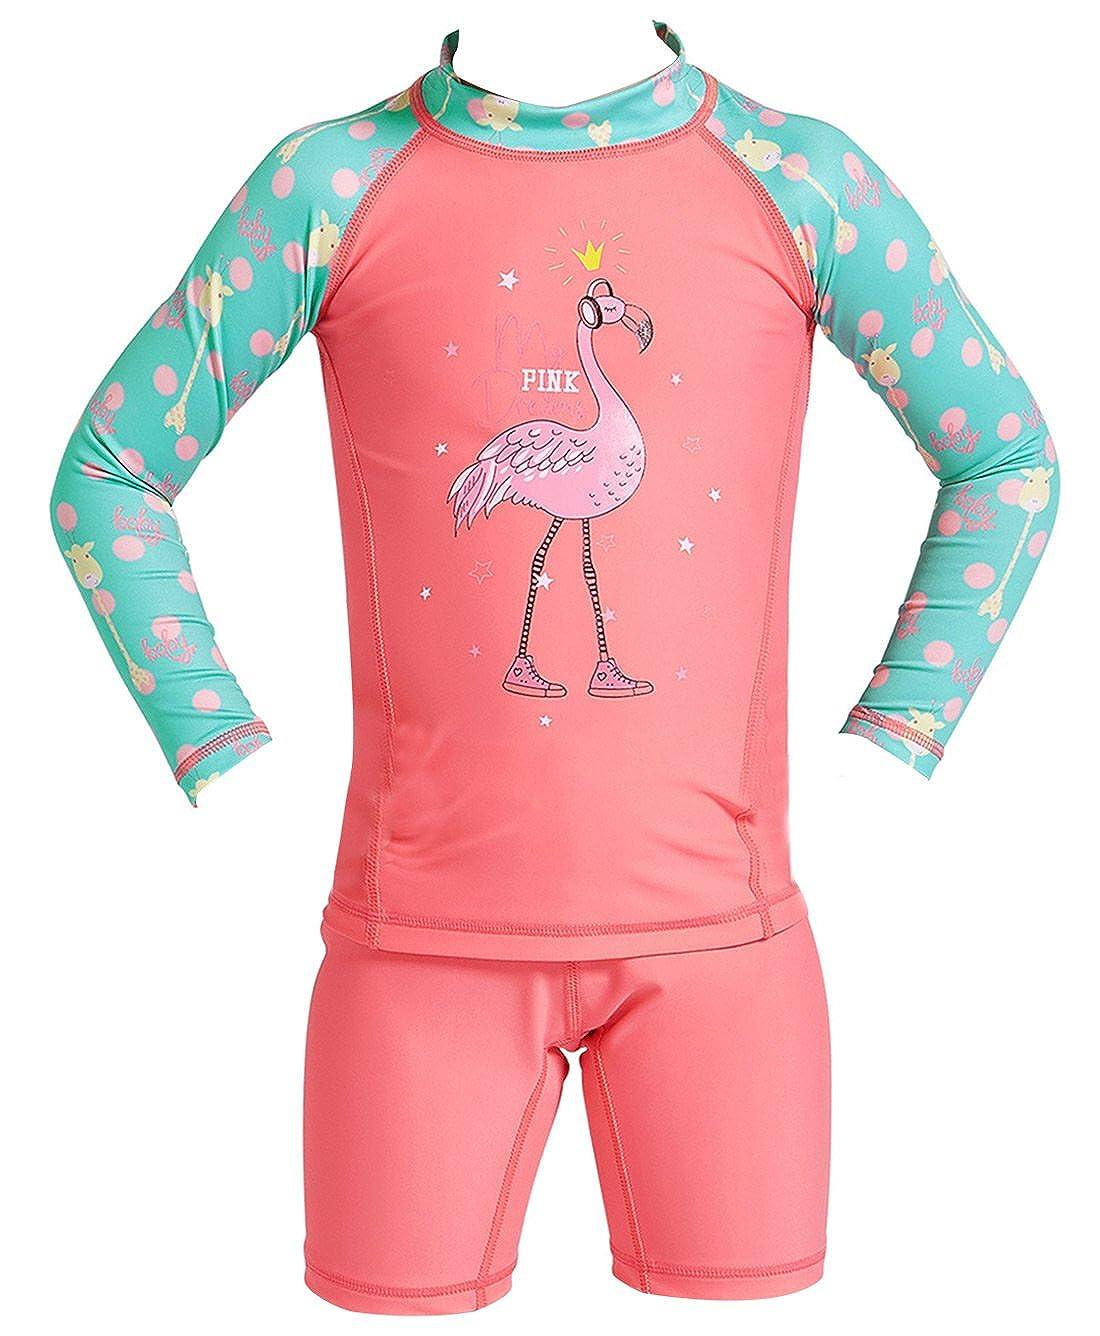 DIVE& SAIL Girls Long Sleeve Rashguard with Shorts Set 2-Piece Swimwear 4-9Y